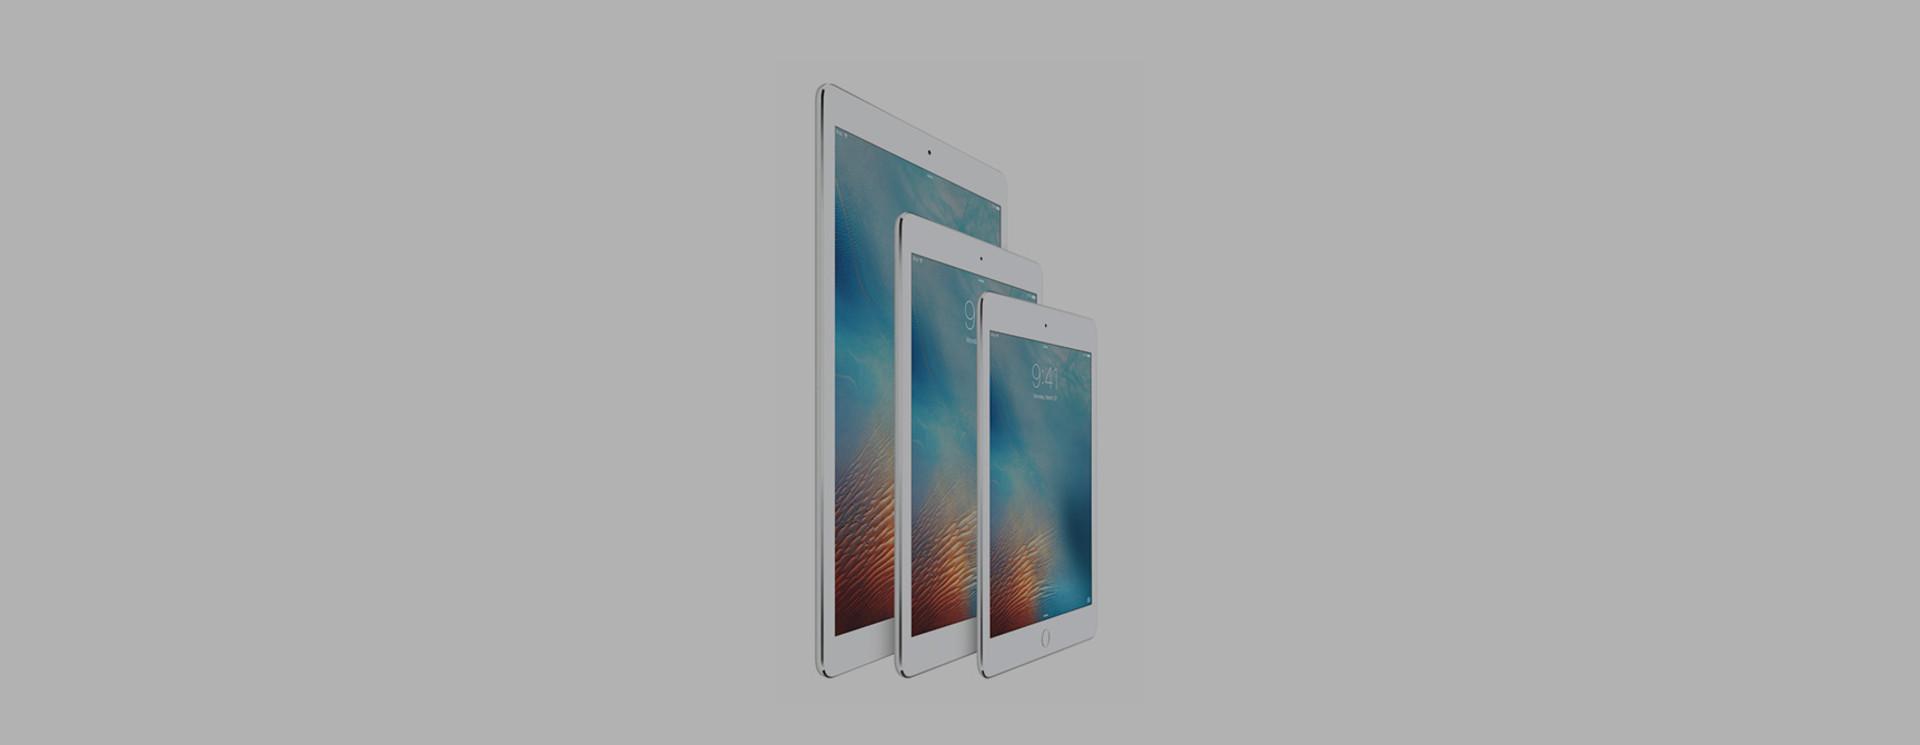 Tablet Topseller Models